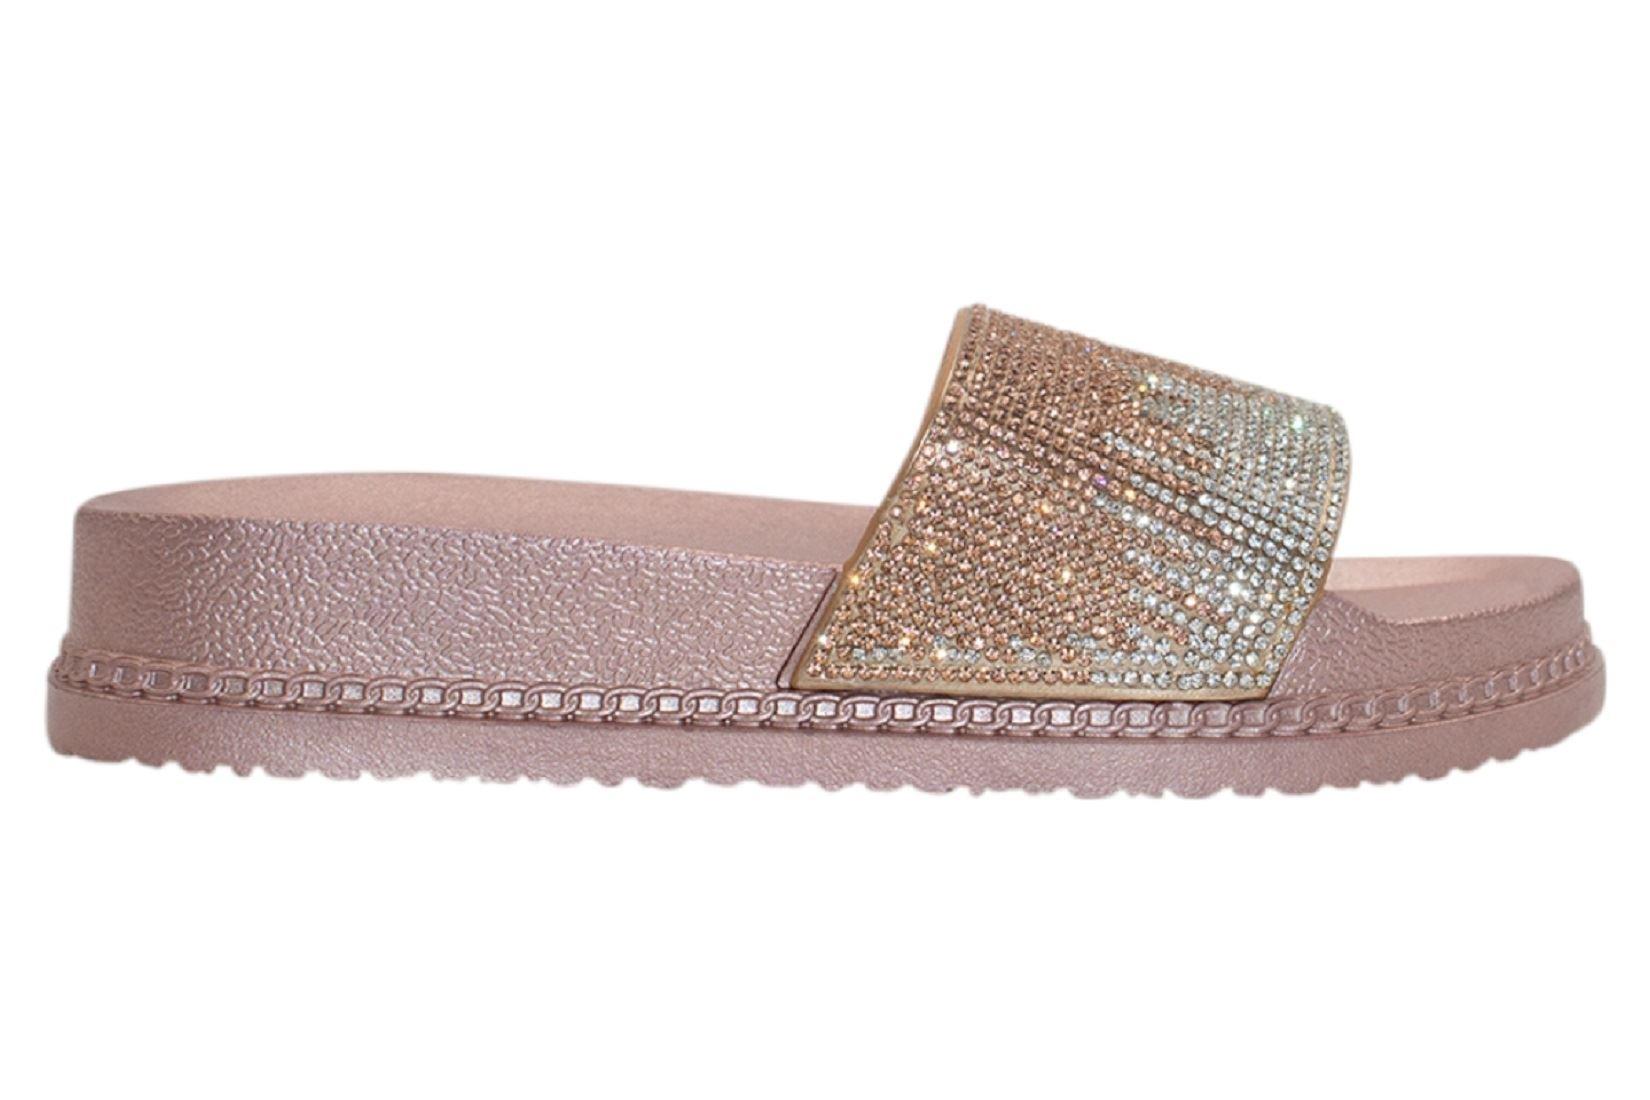 Womens-Sliders-Casual-Slippers-Mules-Ladies-Diamante-Flip-Flop-Sandals-Shoes thumbnail 41